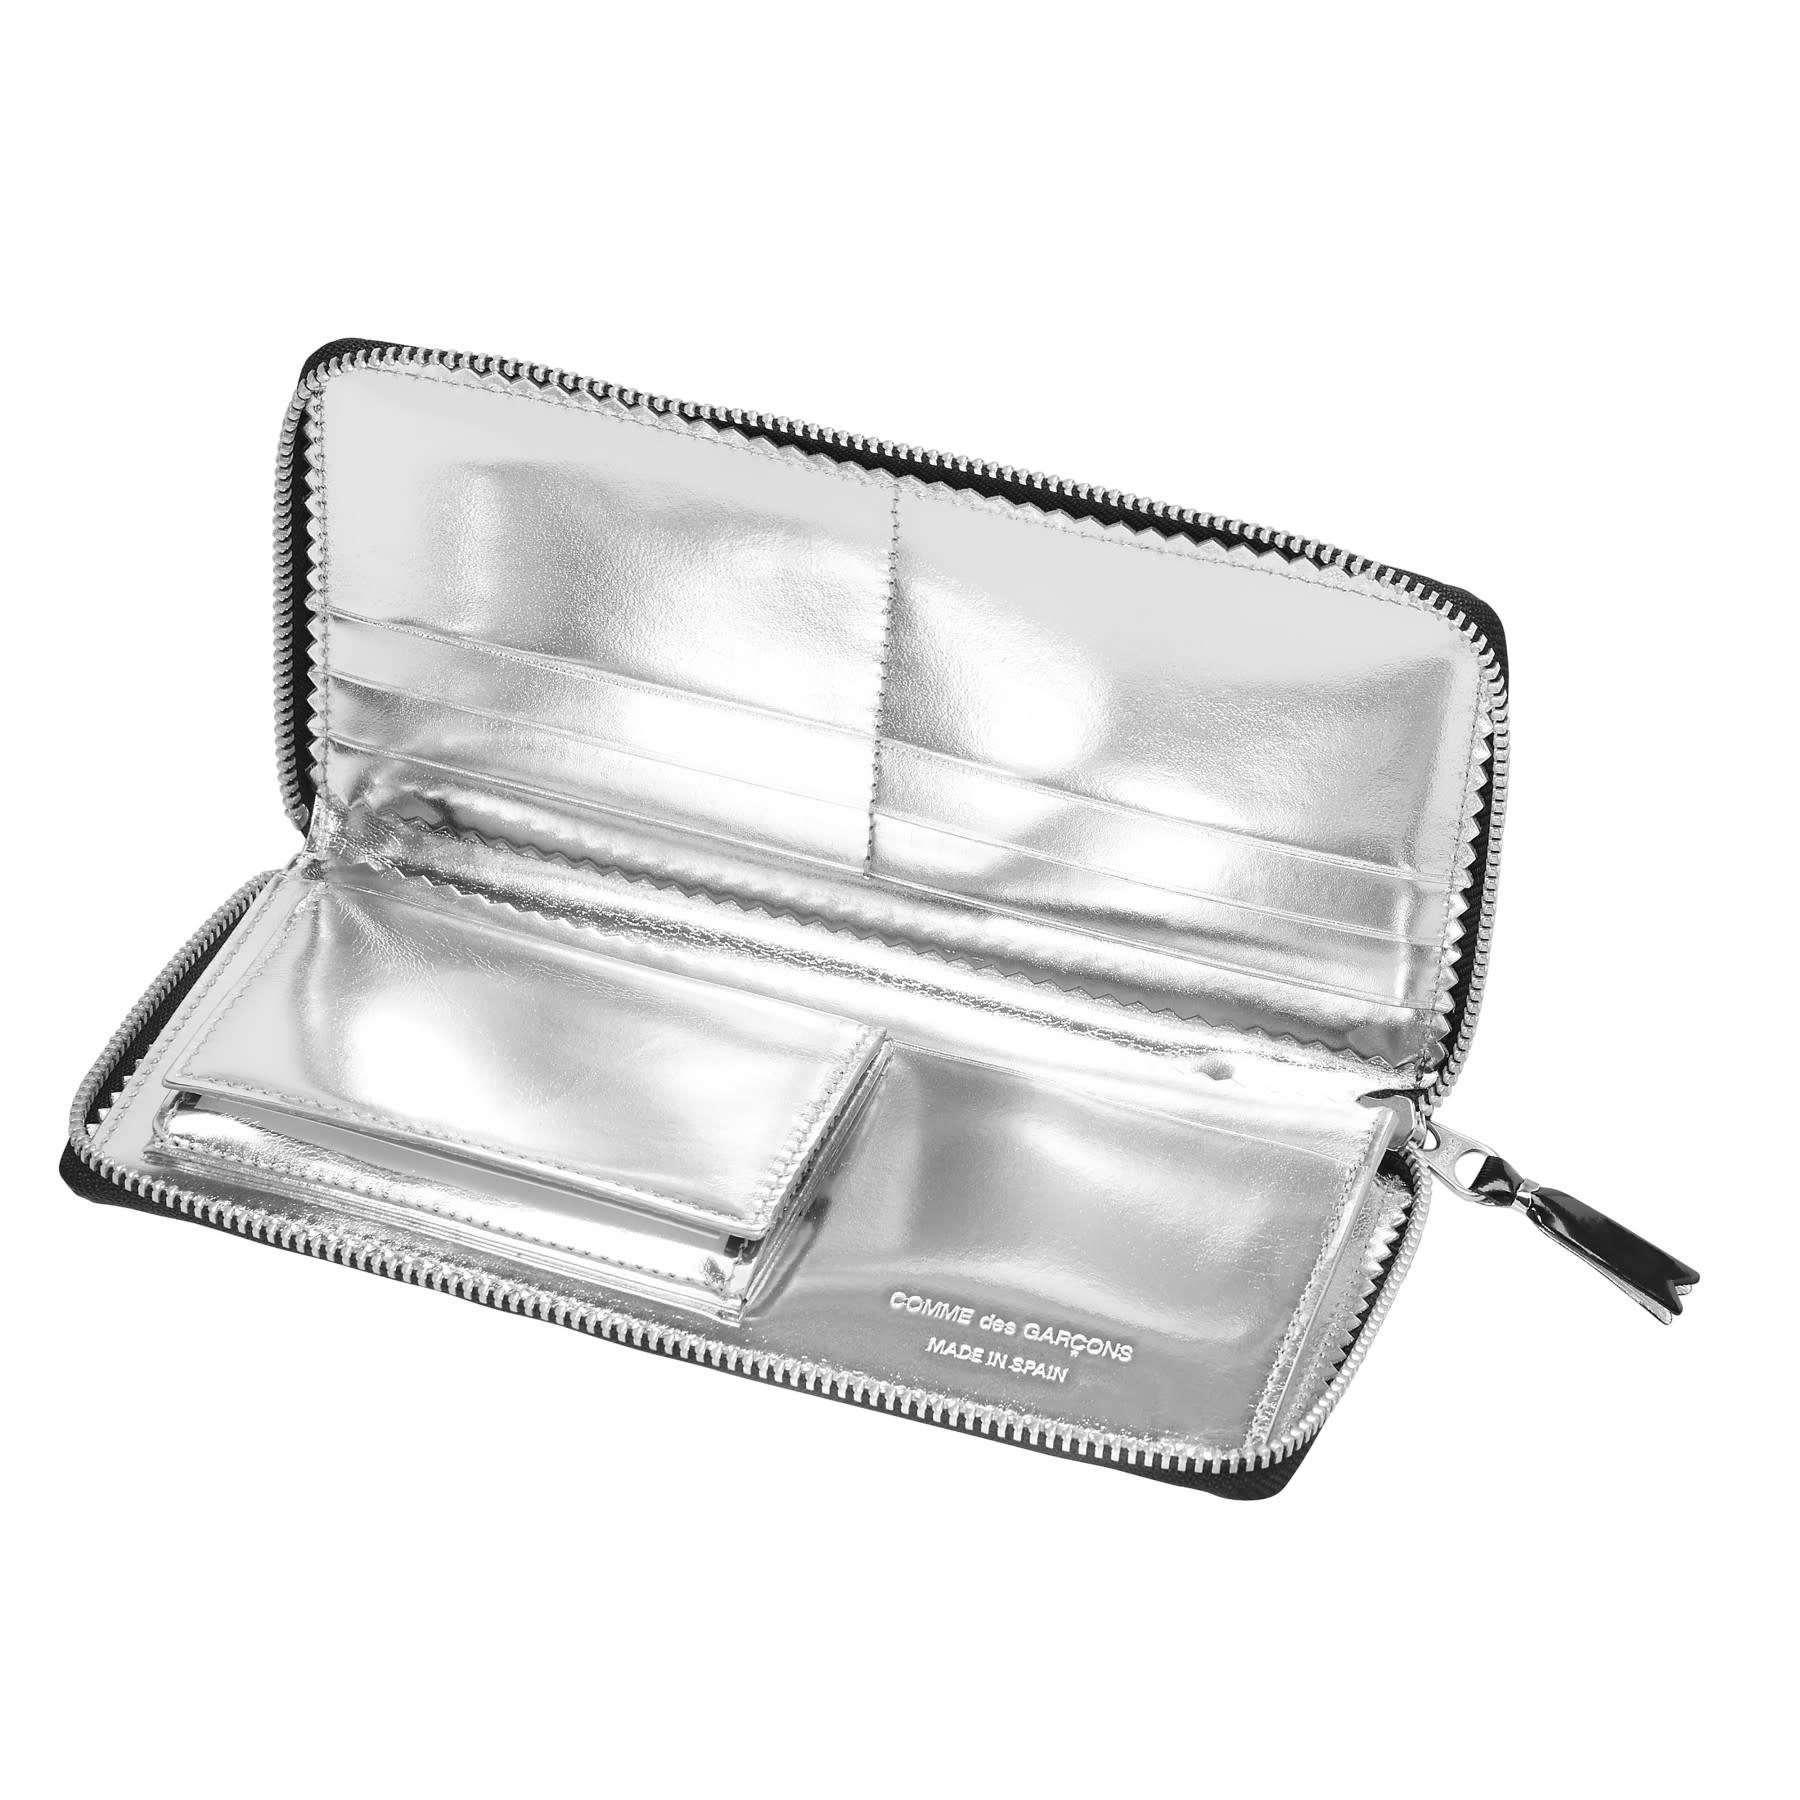 COMME des GARÇONS WALLET  Large Black Zip Wallet with Silver Metallic Interior